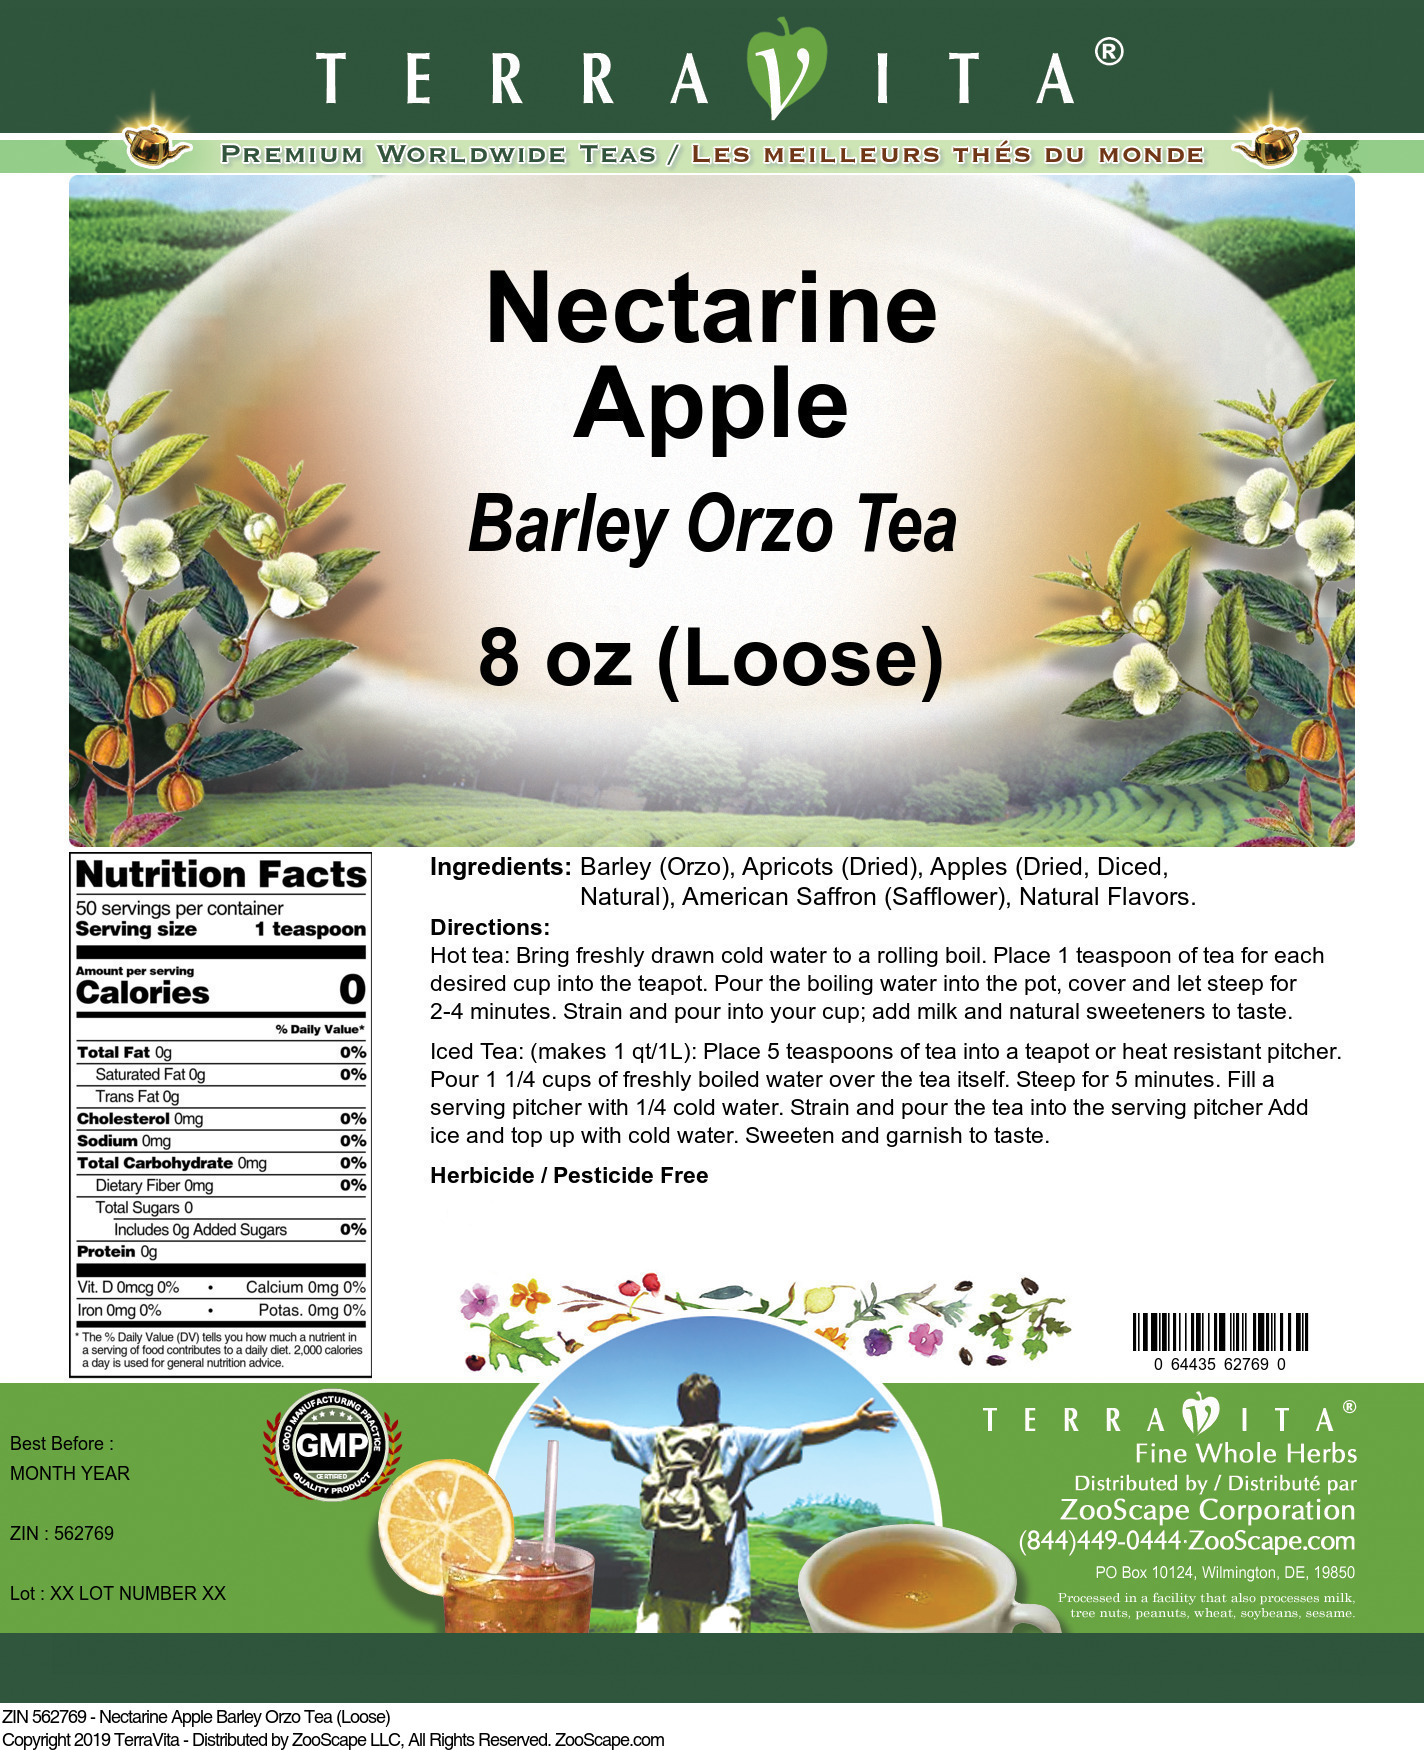 Nectarine Apple Barley Orzo Tea (Loose)